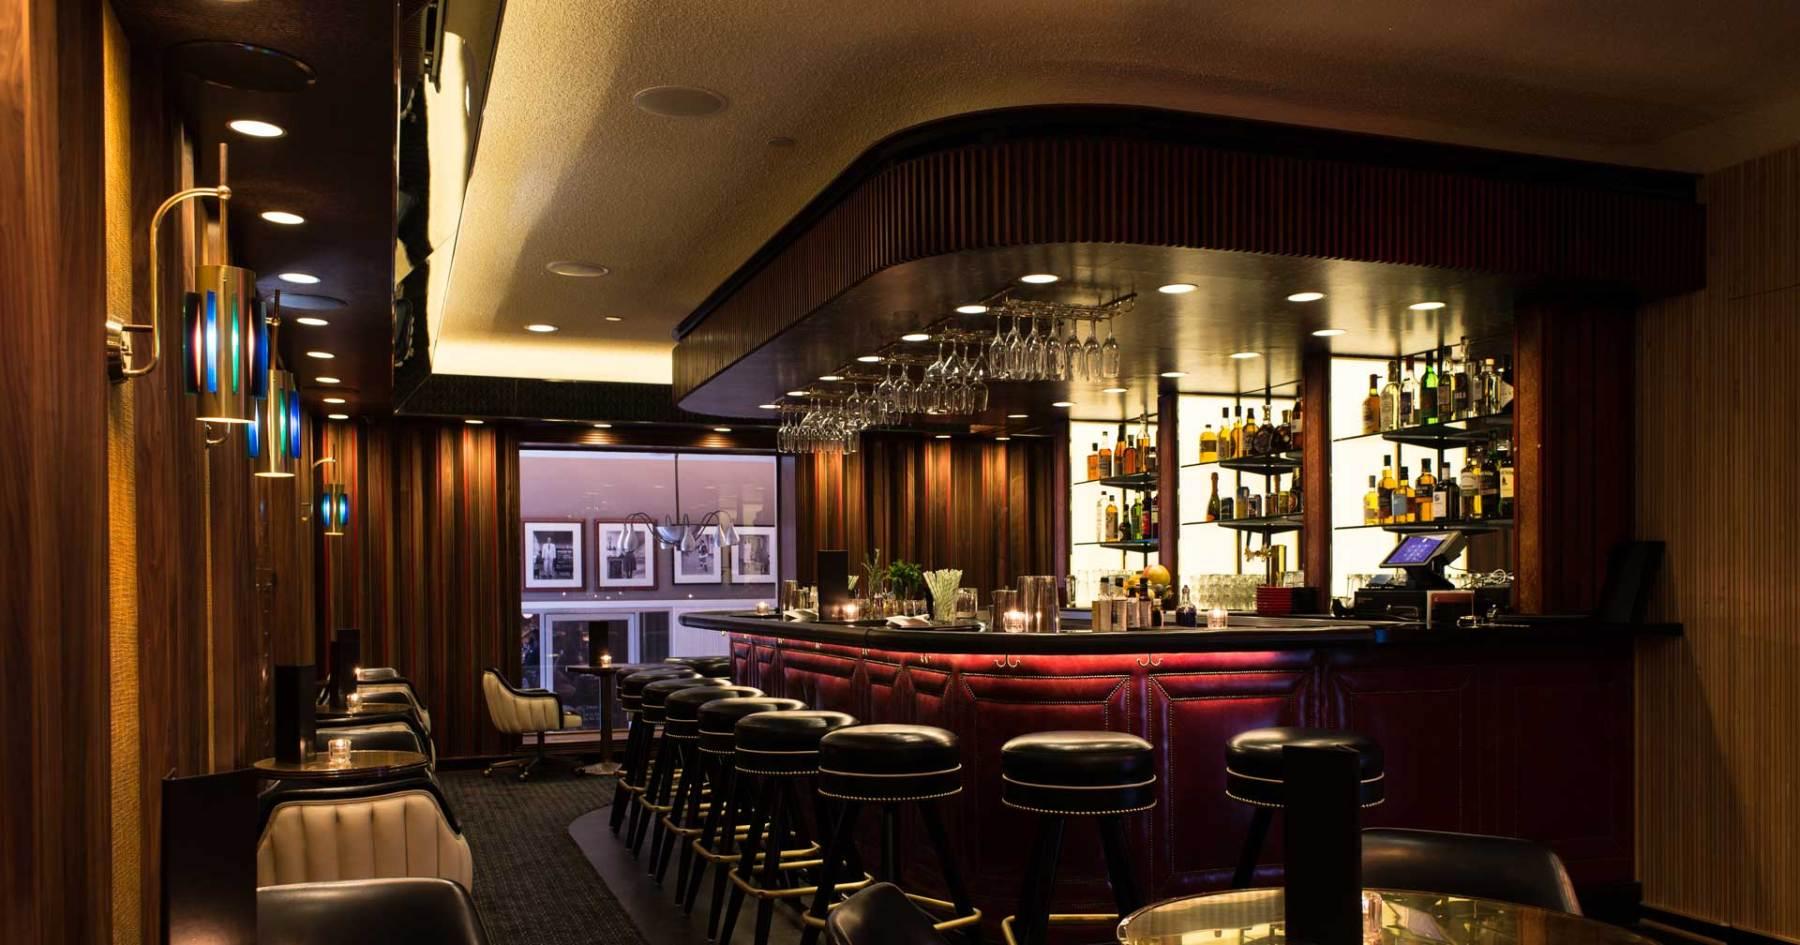 The 17 Best LA Bars for Grabbing Last Call